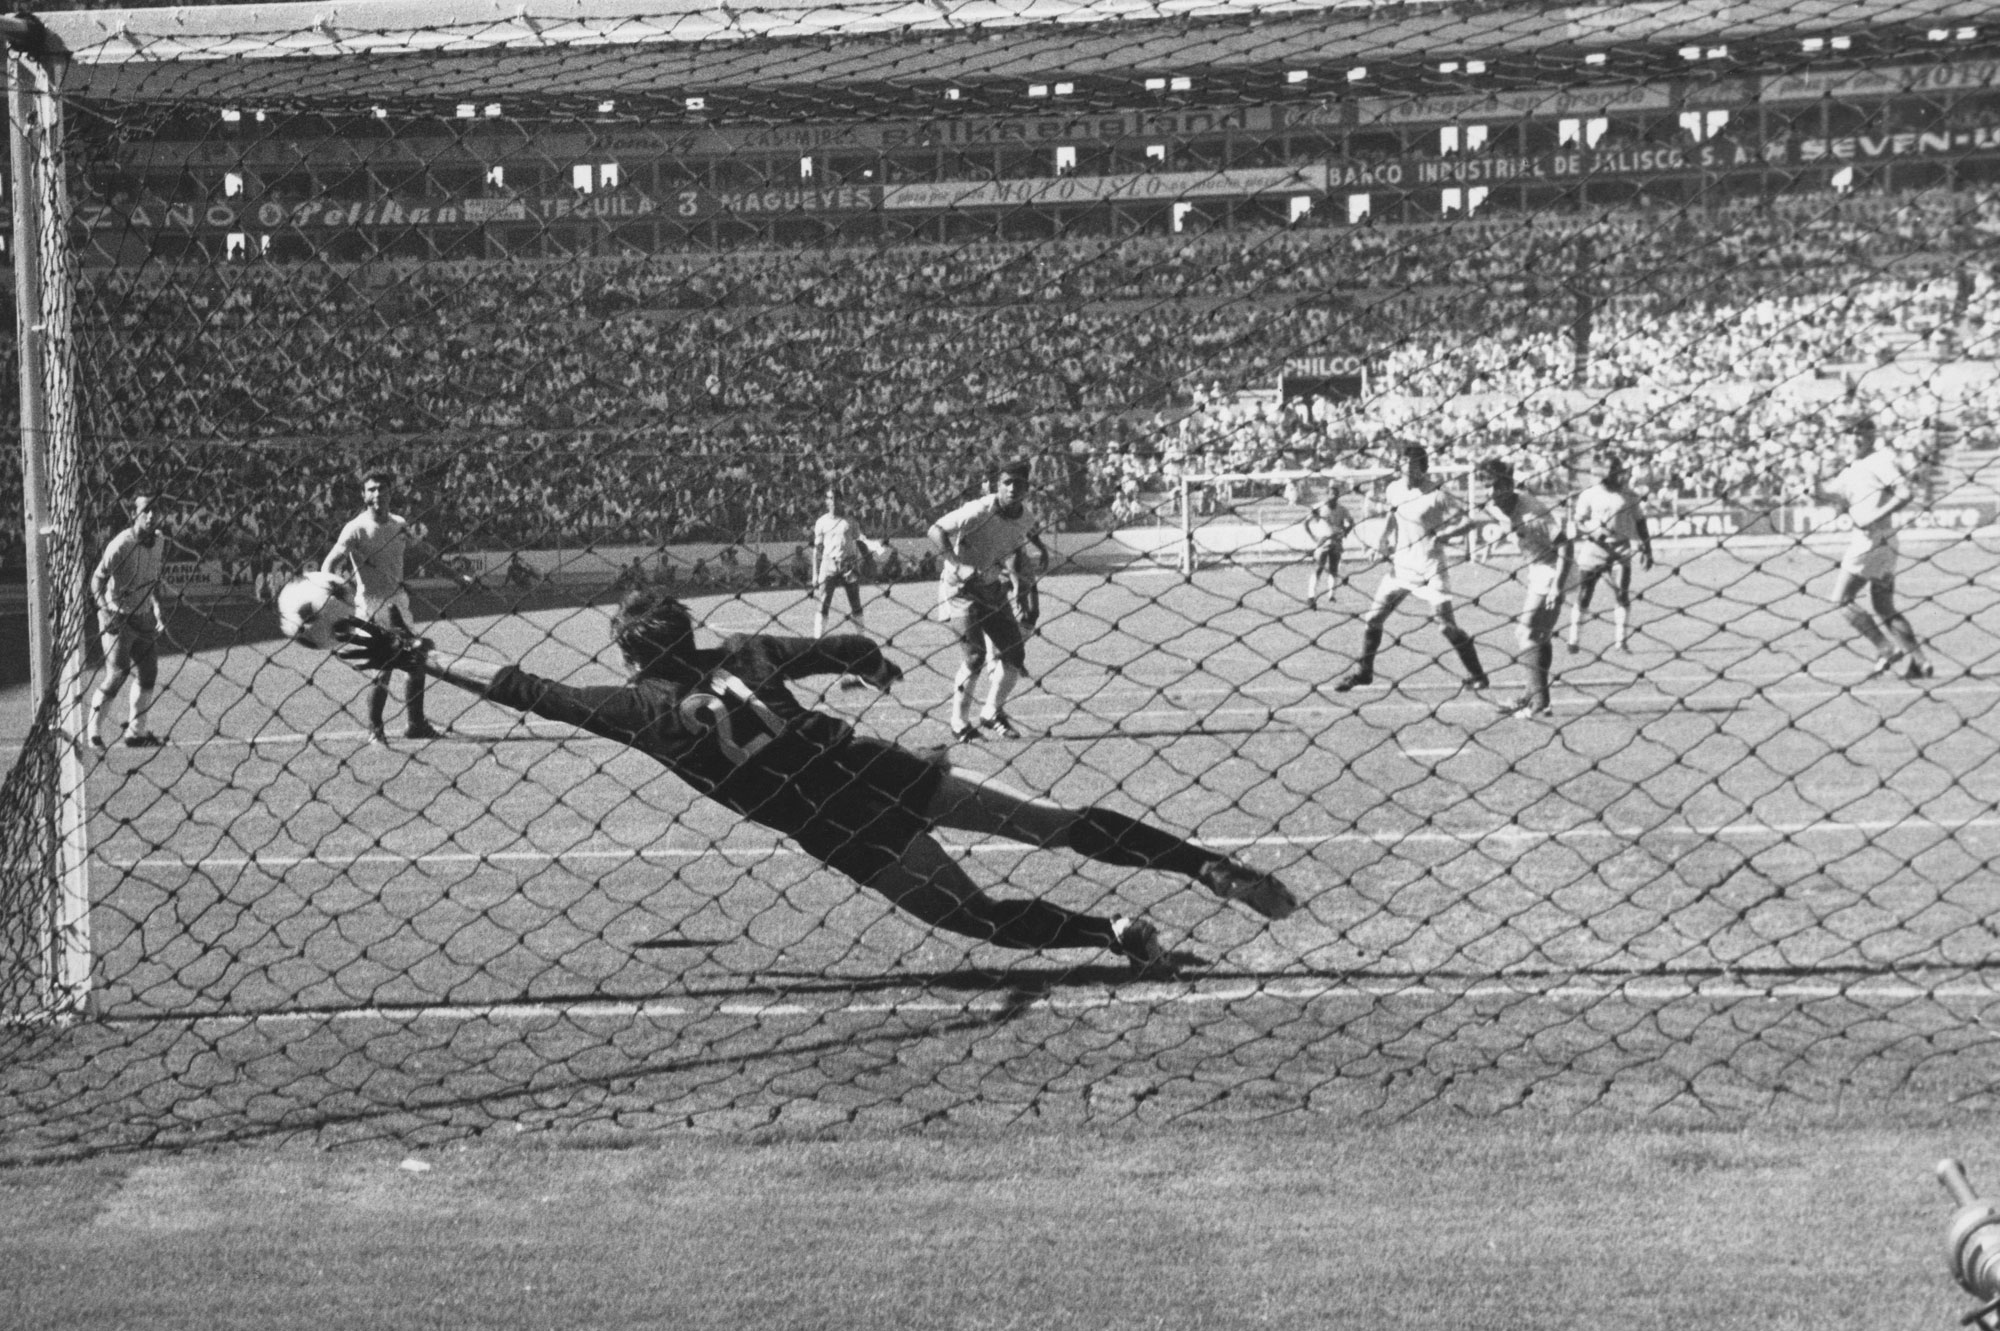 Gol Brasil70